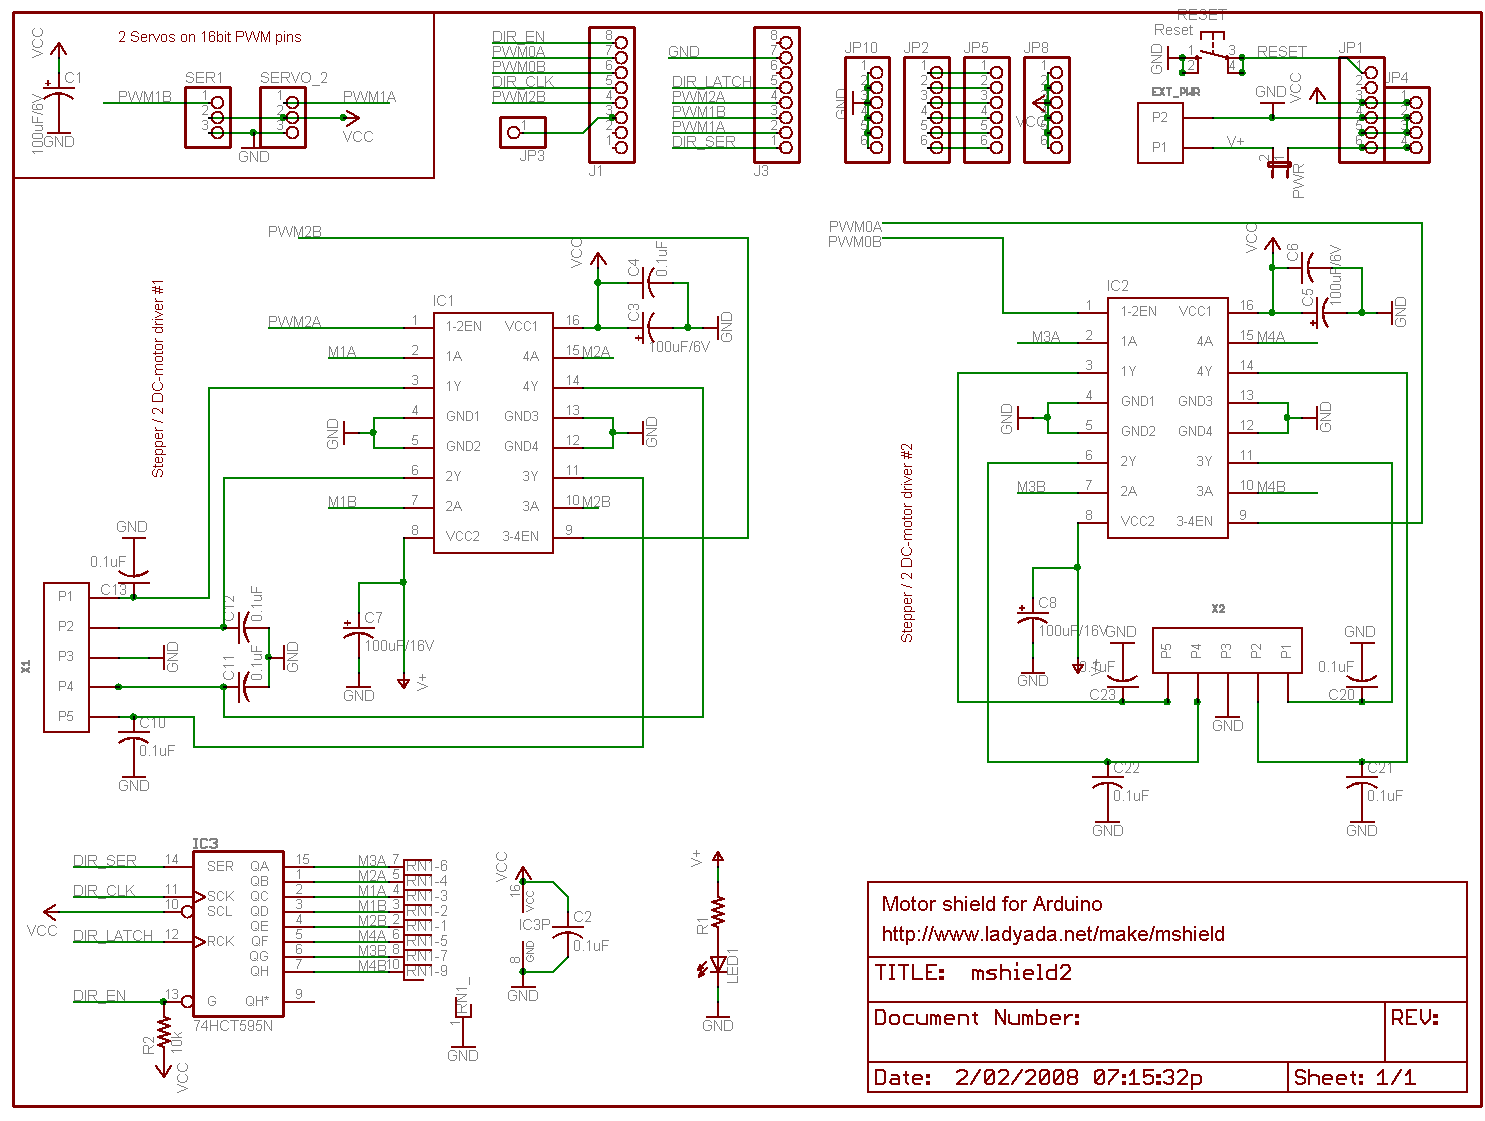 DIYmall GPRS/GPS SIM908 Module - AT Commands - Arduino